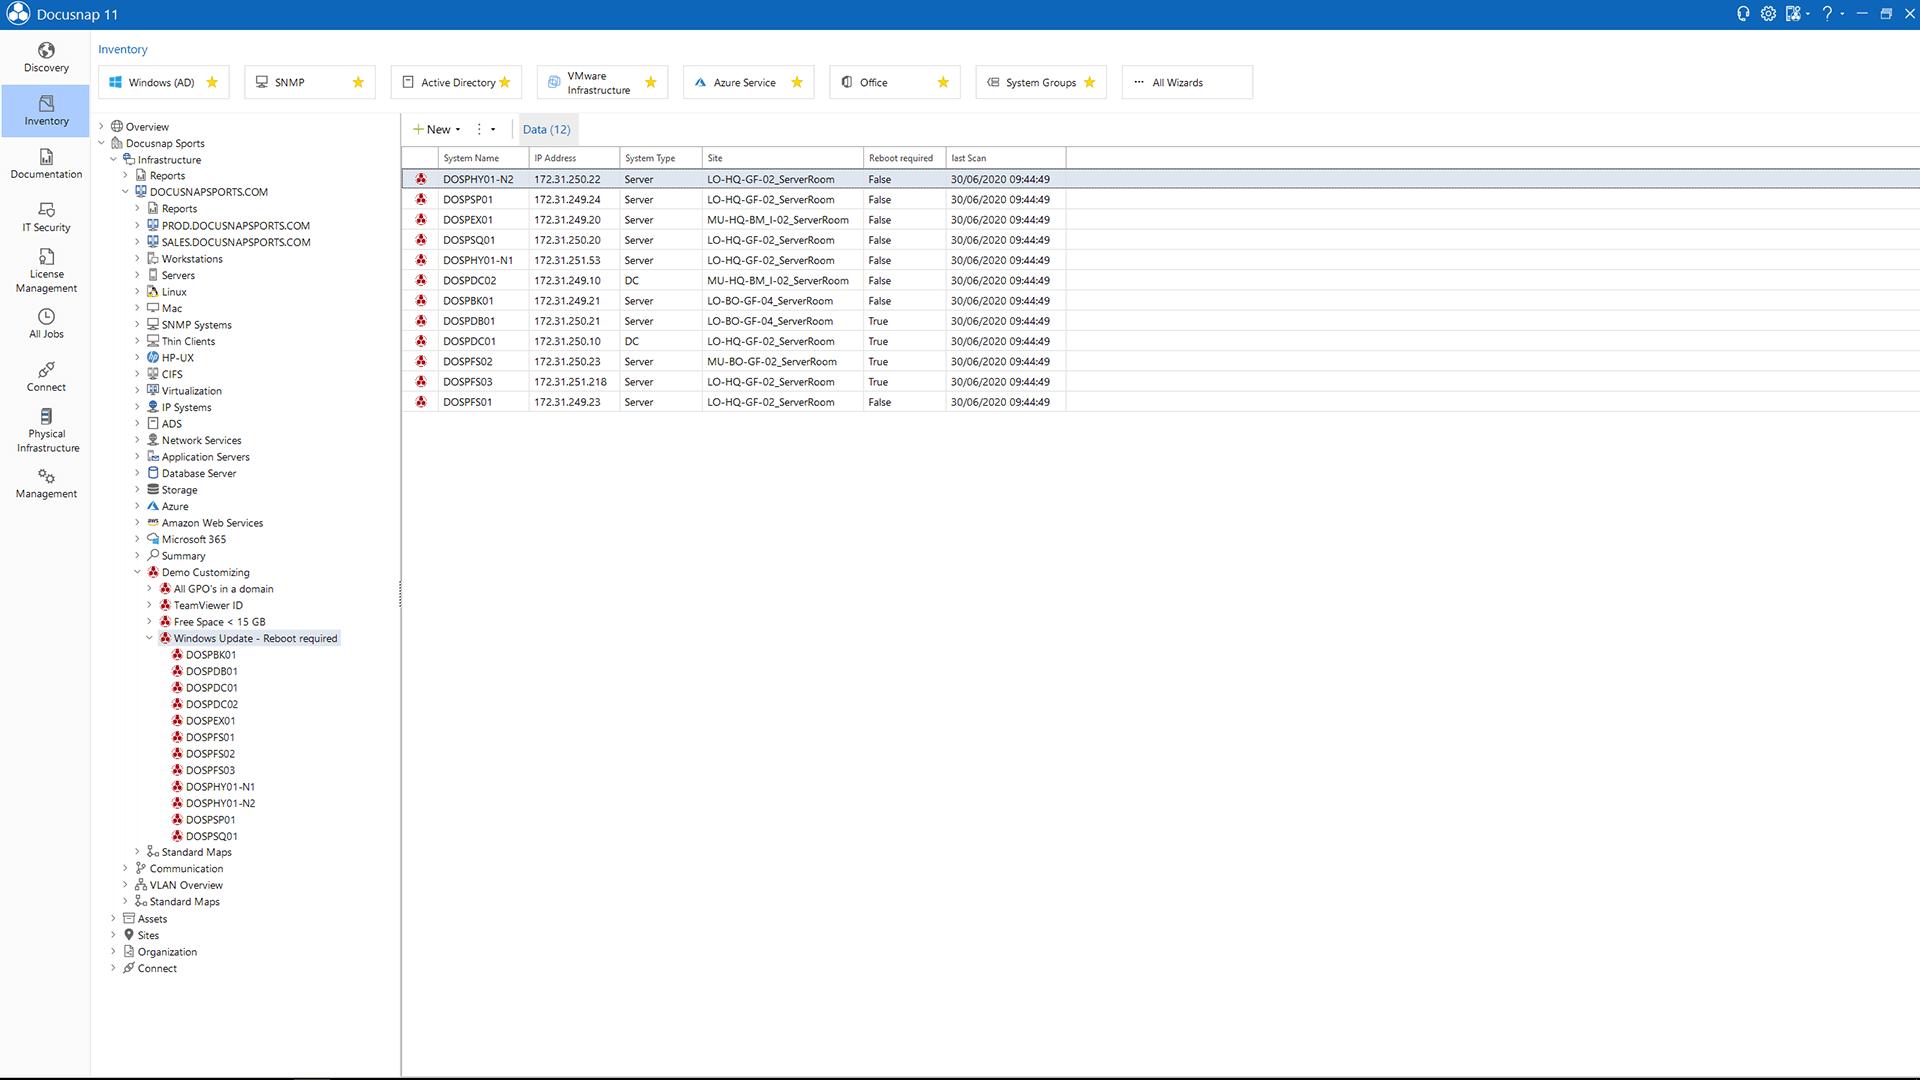 Screenshot: Customizing Results